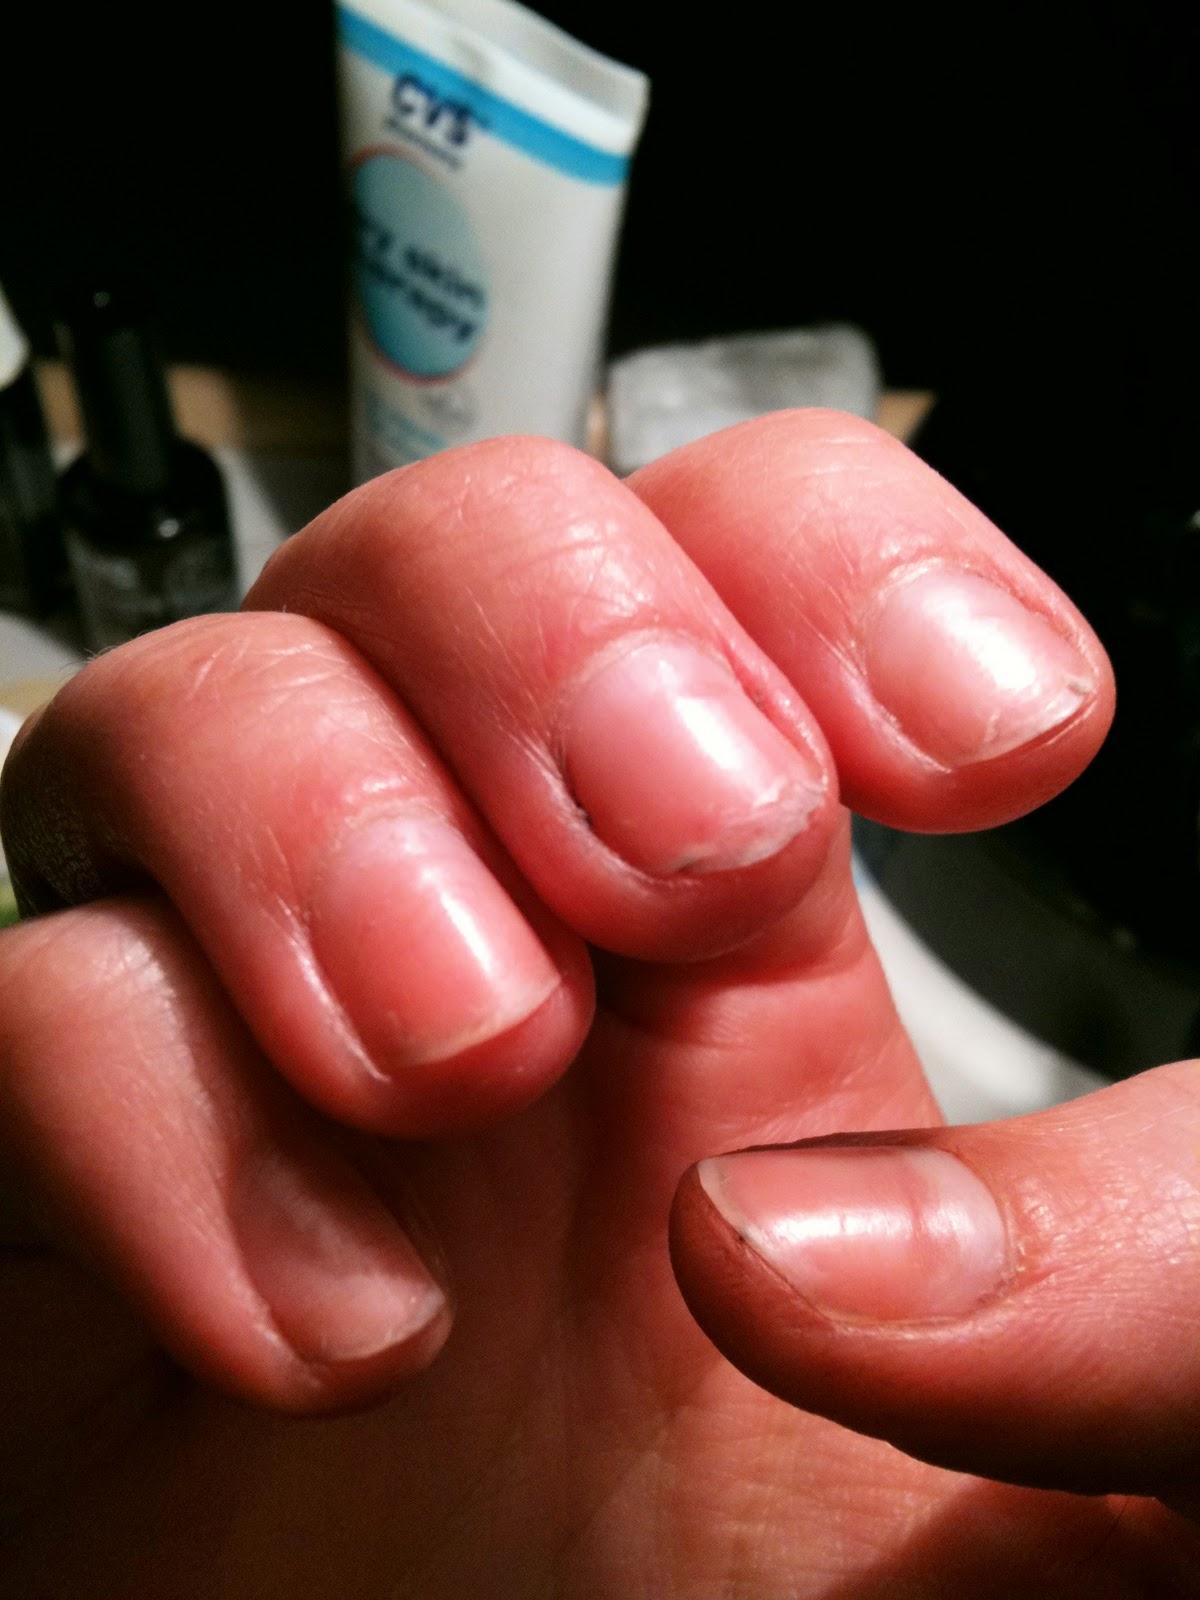 Shynk!: Nail damage :(